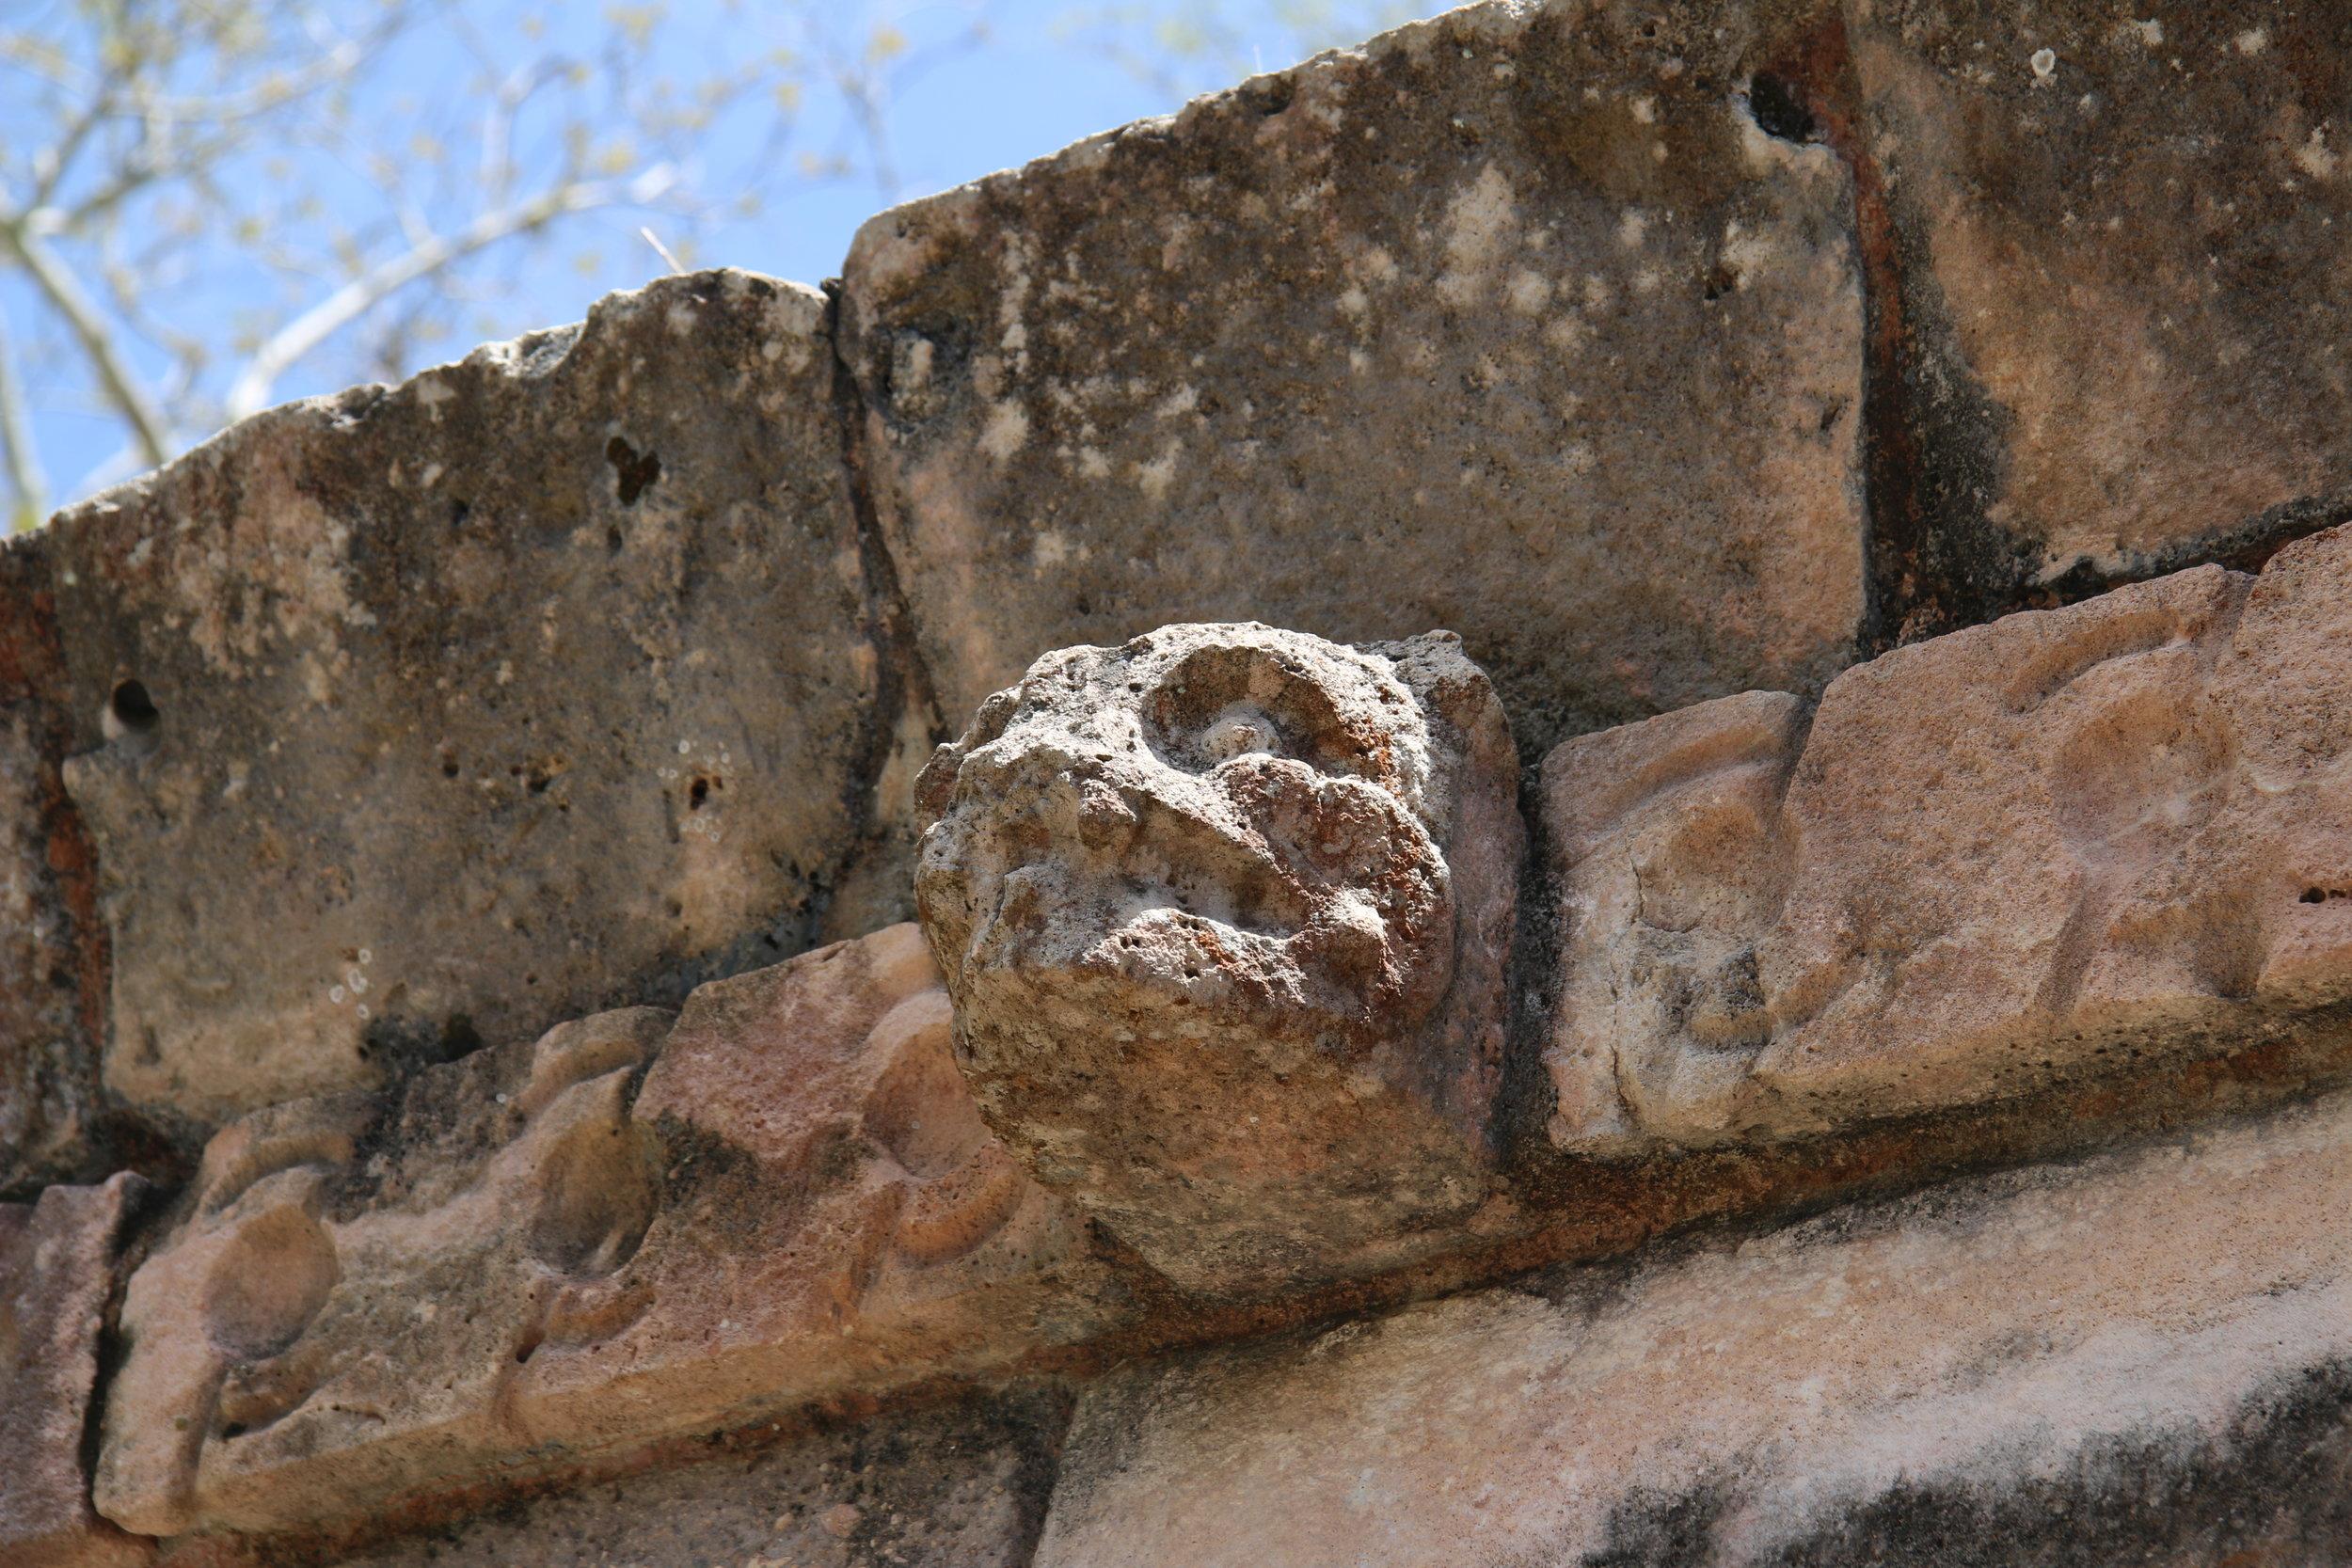 A jaguar head in stone